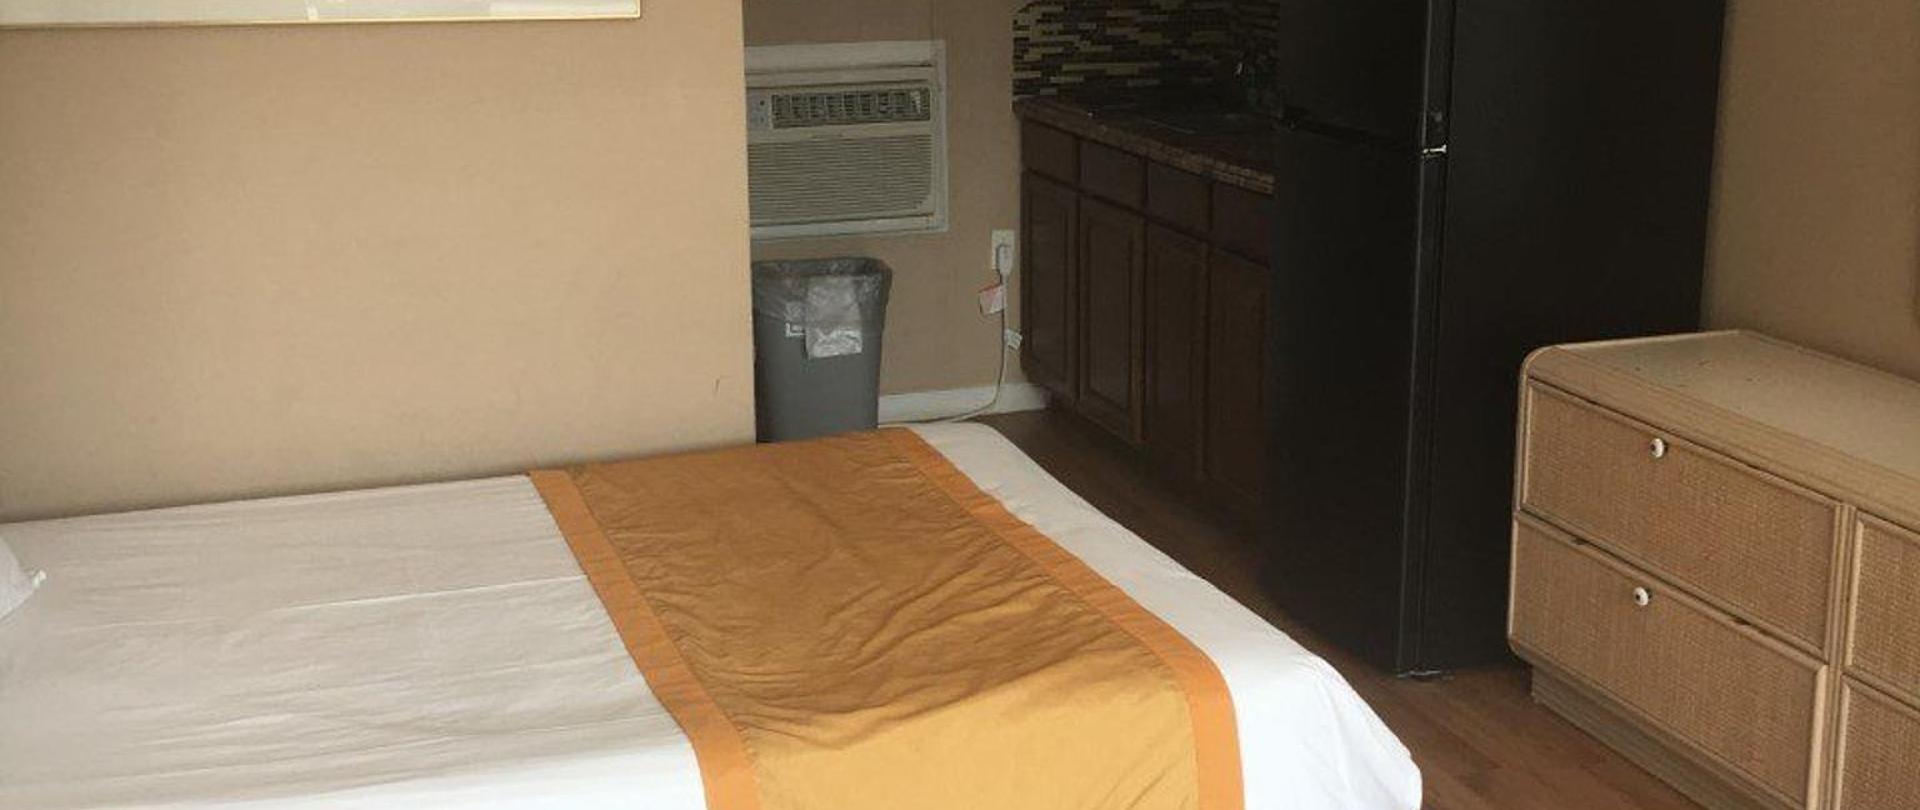 room-5a-1.jpg